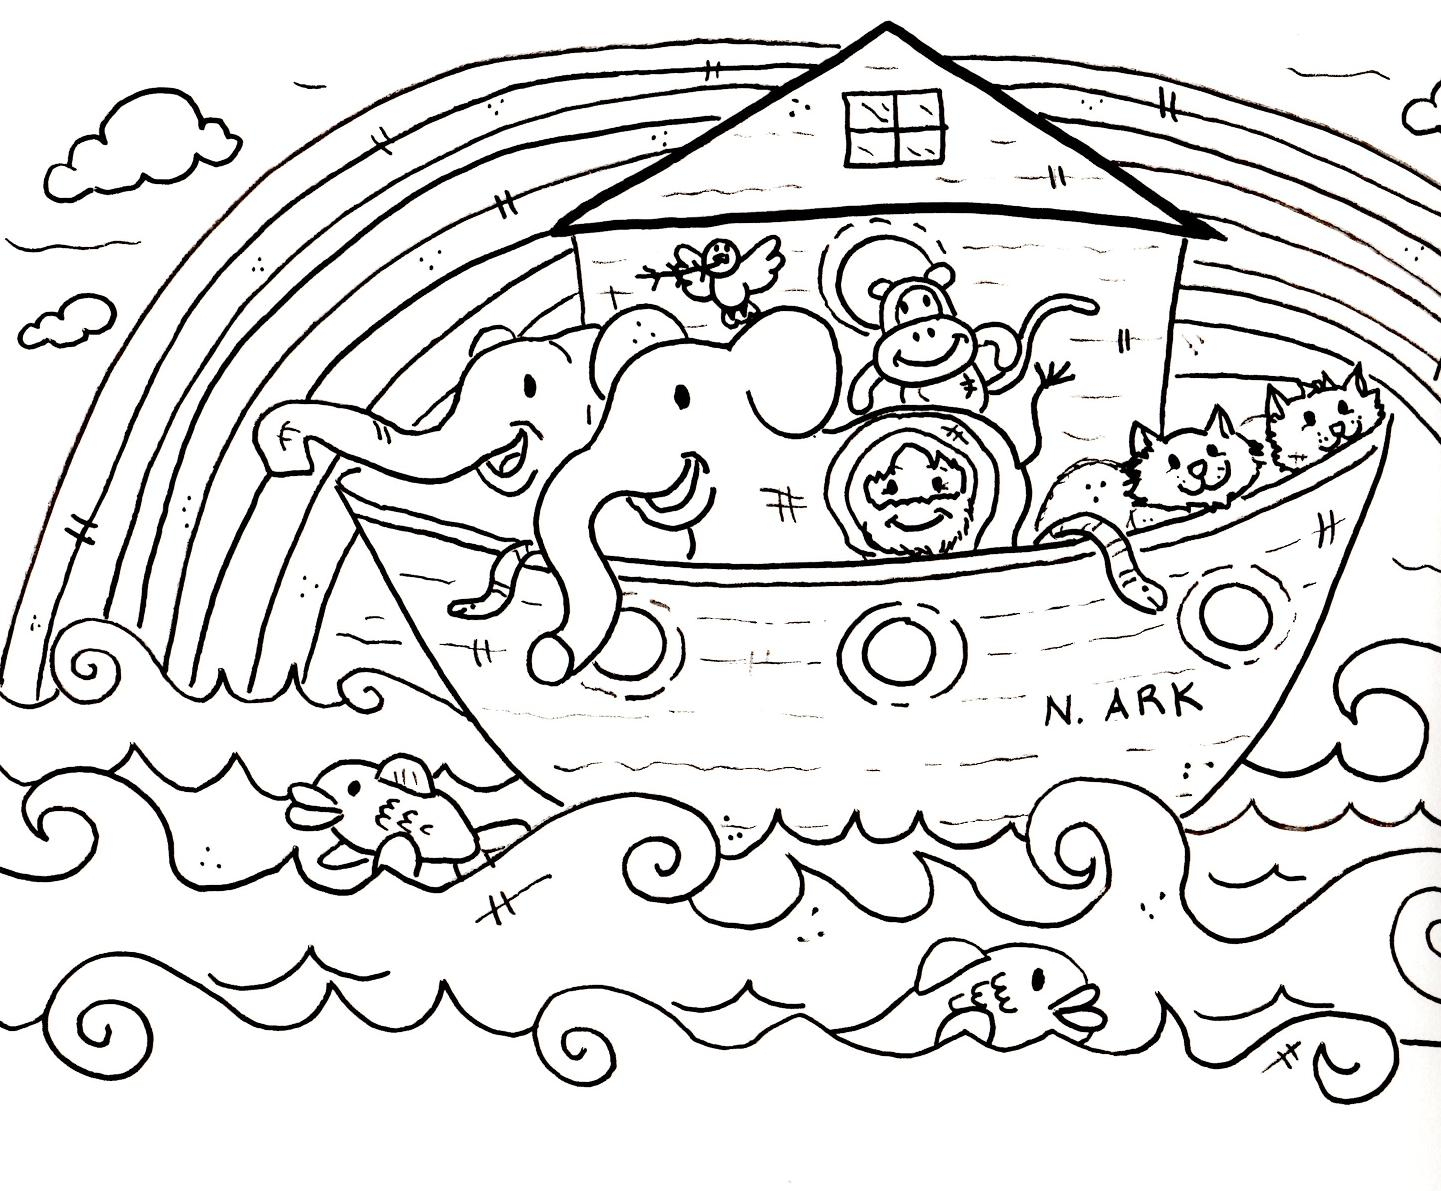 54 Desenhos Biblicos Para Colorir E Imprimir Gratis